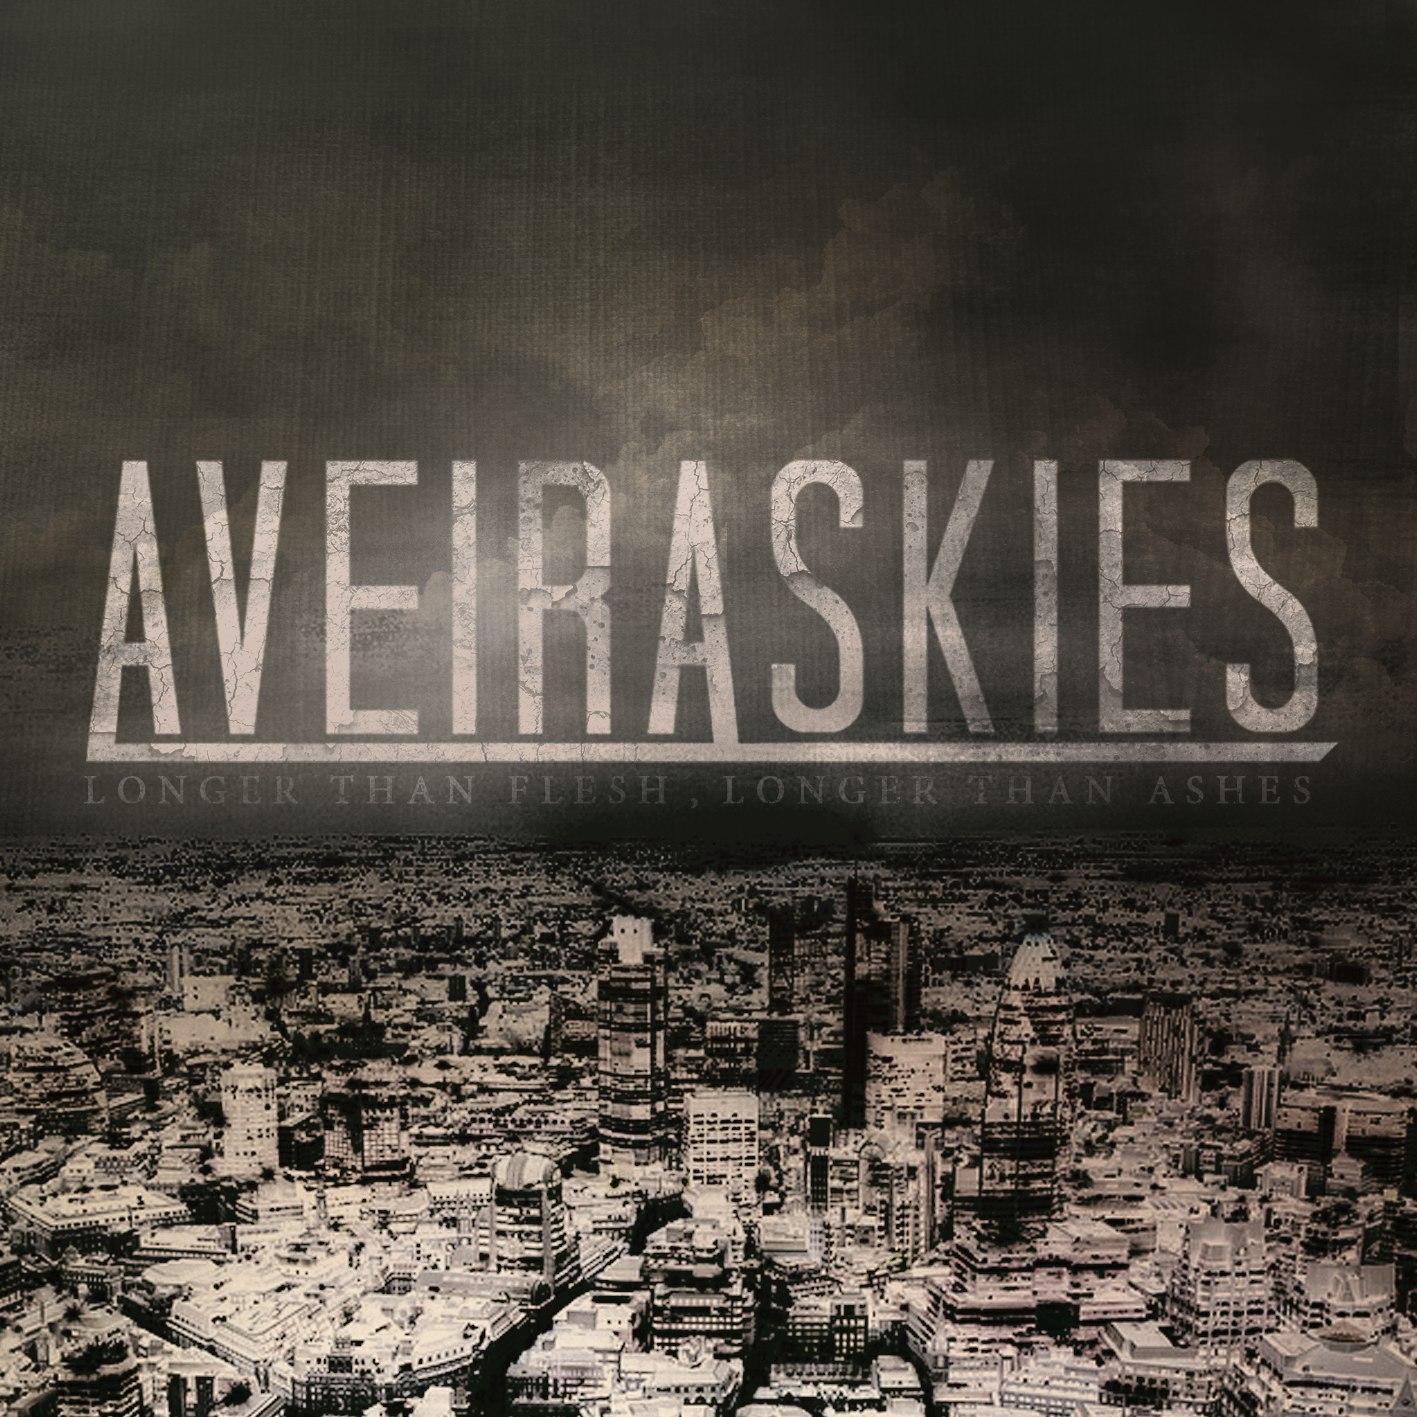 Aveira Skies - Longer Than Flesh, Longer Than Ashes [EP] (2011)